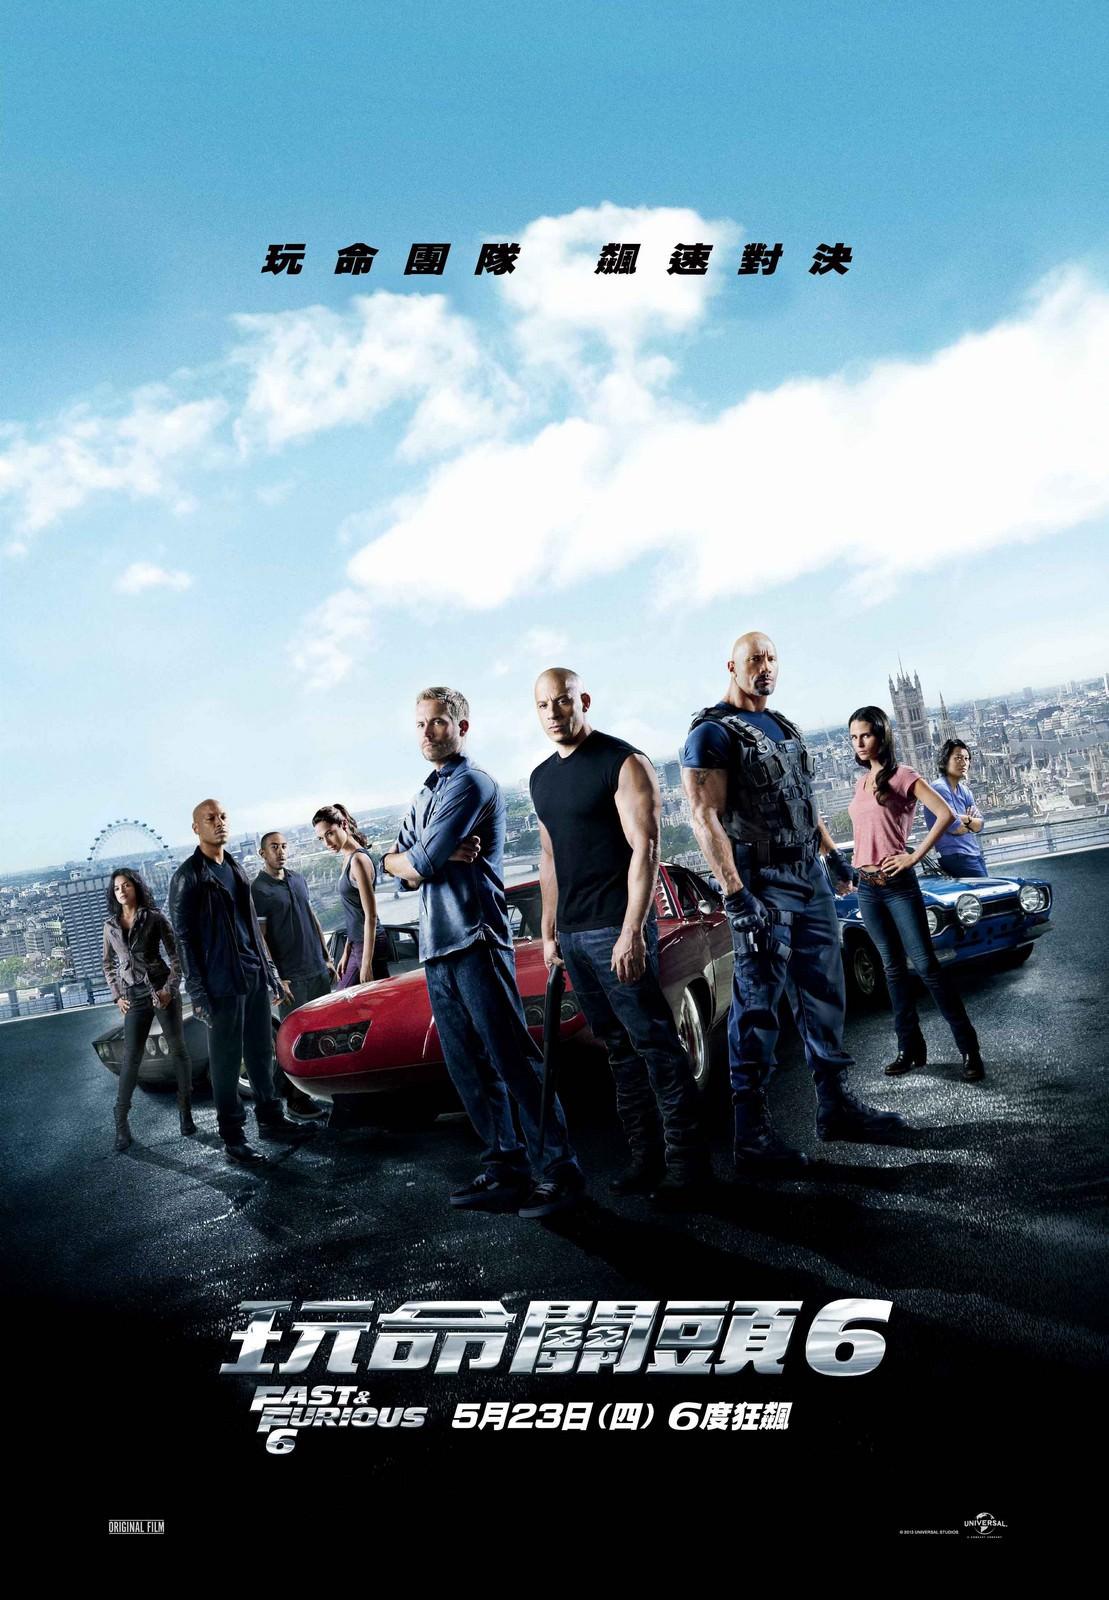 Movie, Fast & Furious 6(美國, 2013年) / 玩命關頭6(台灣) / 速度与激情6(中國) / 狂野時速6(香港), 電影海報, 台灣